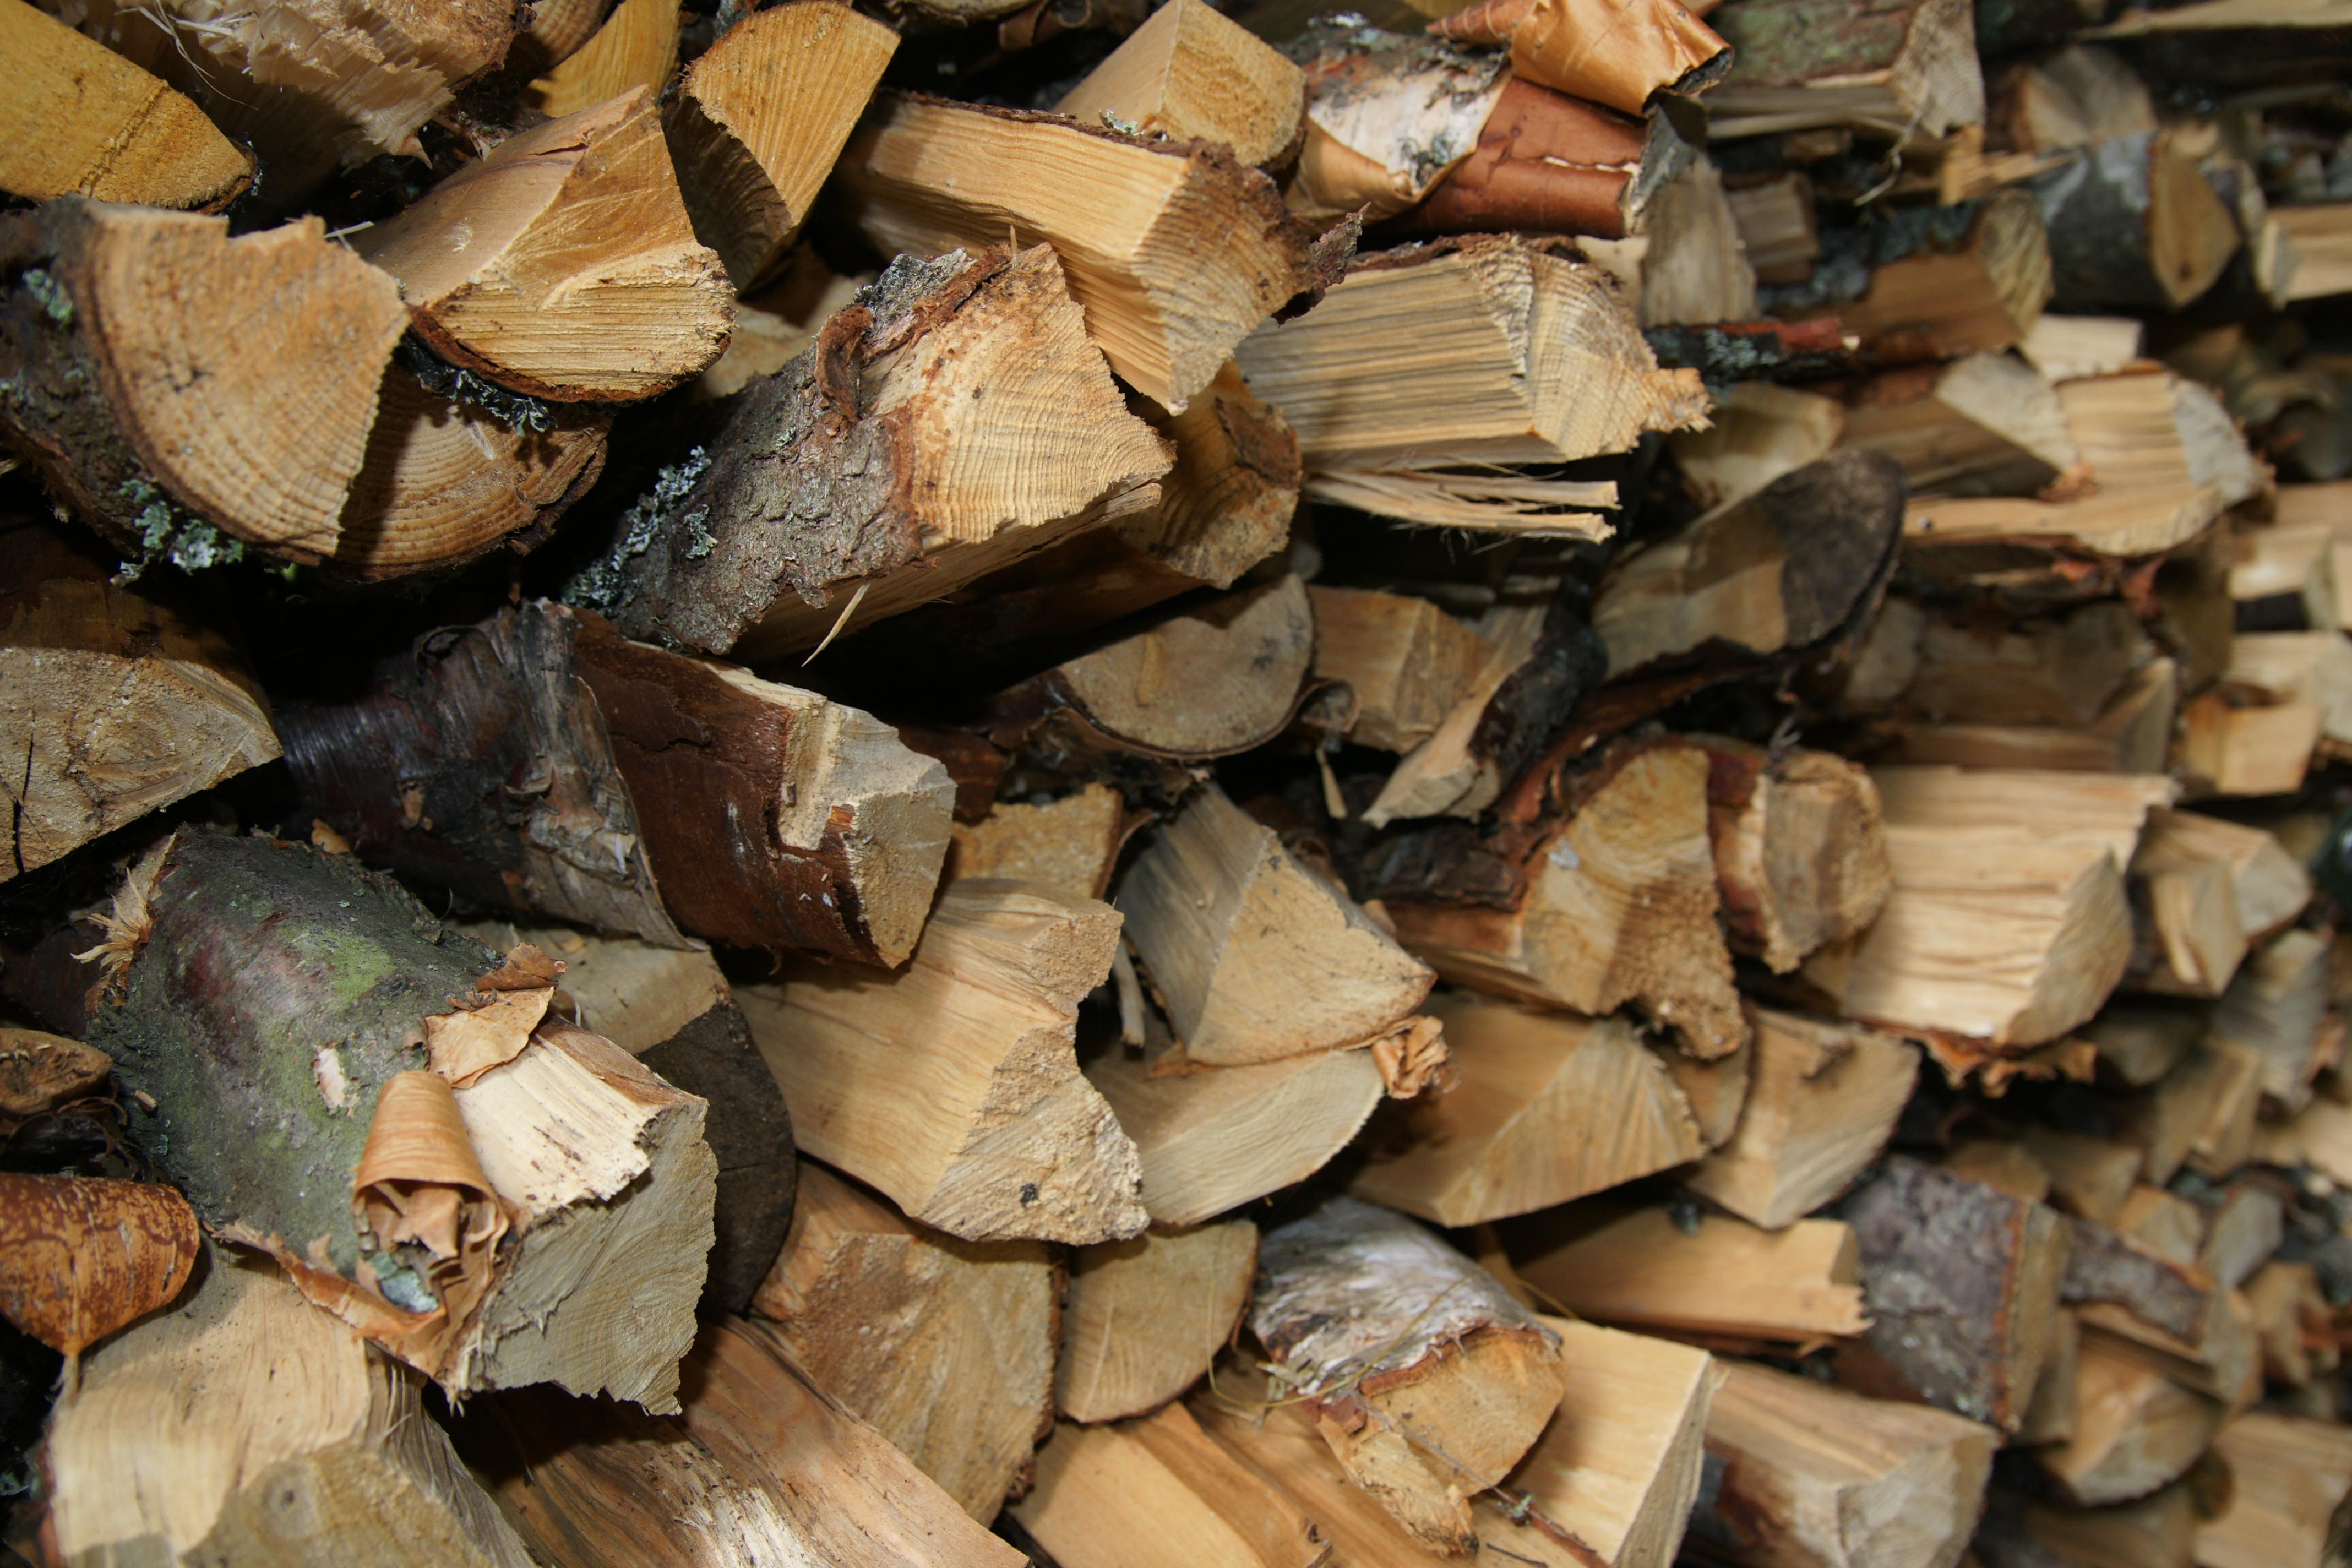 File:Pile of woods.JPG - Wikimedia Commons